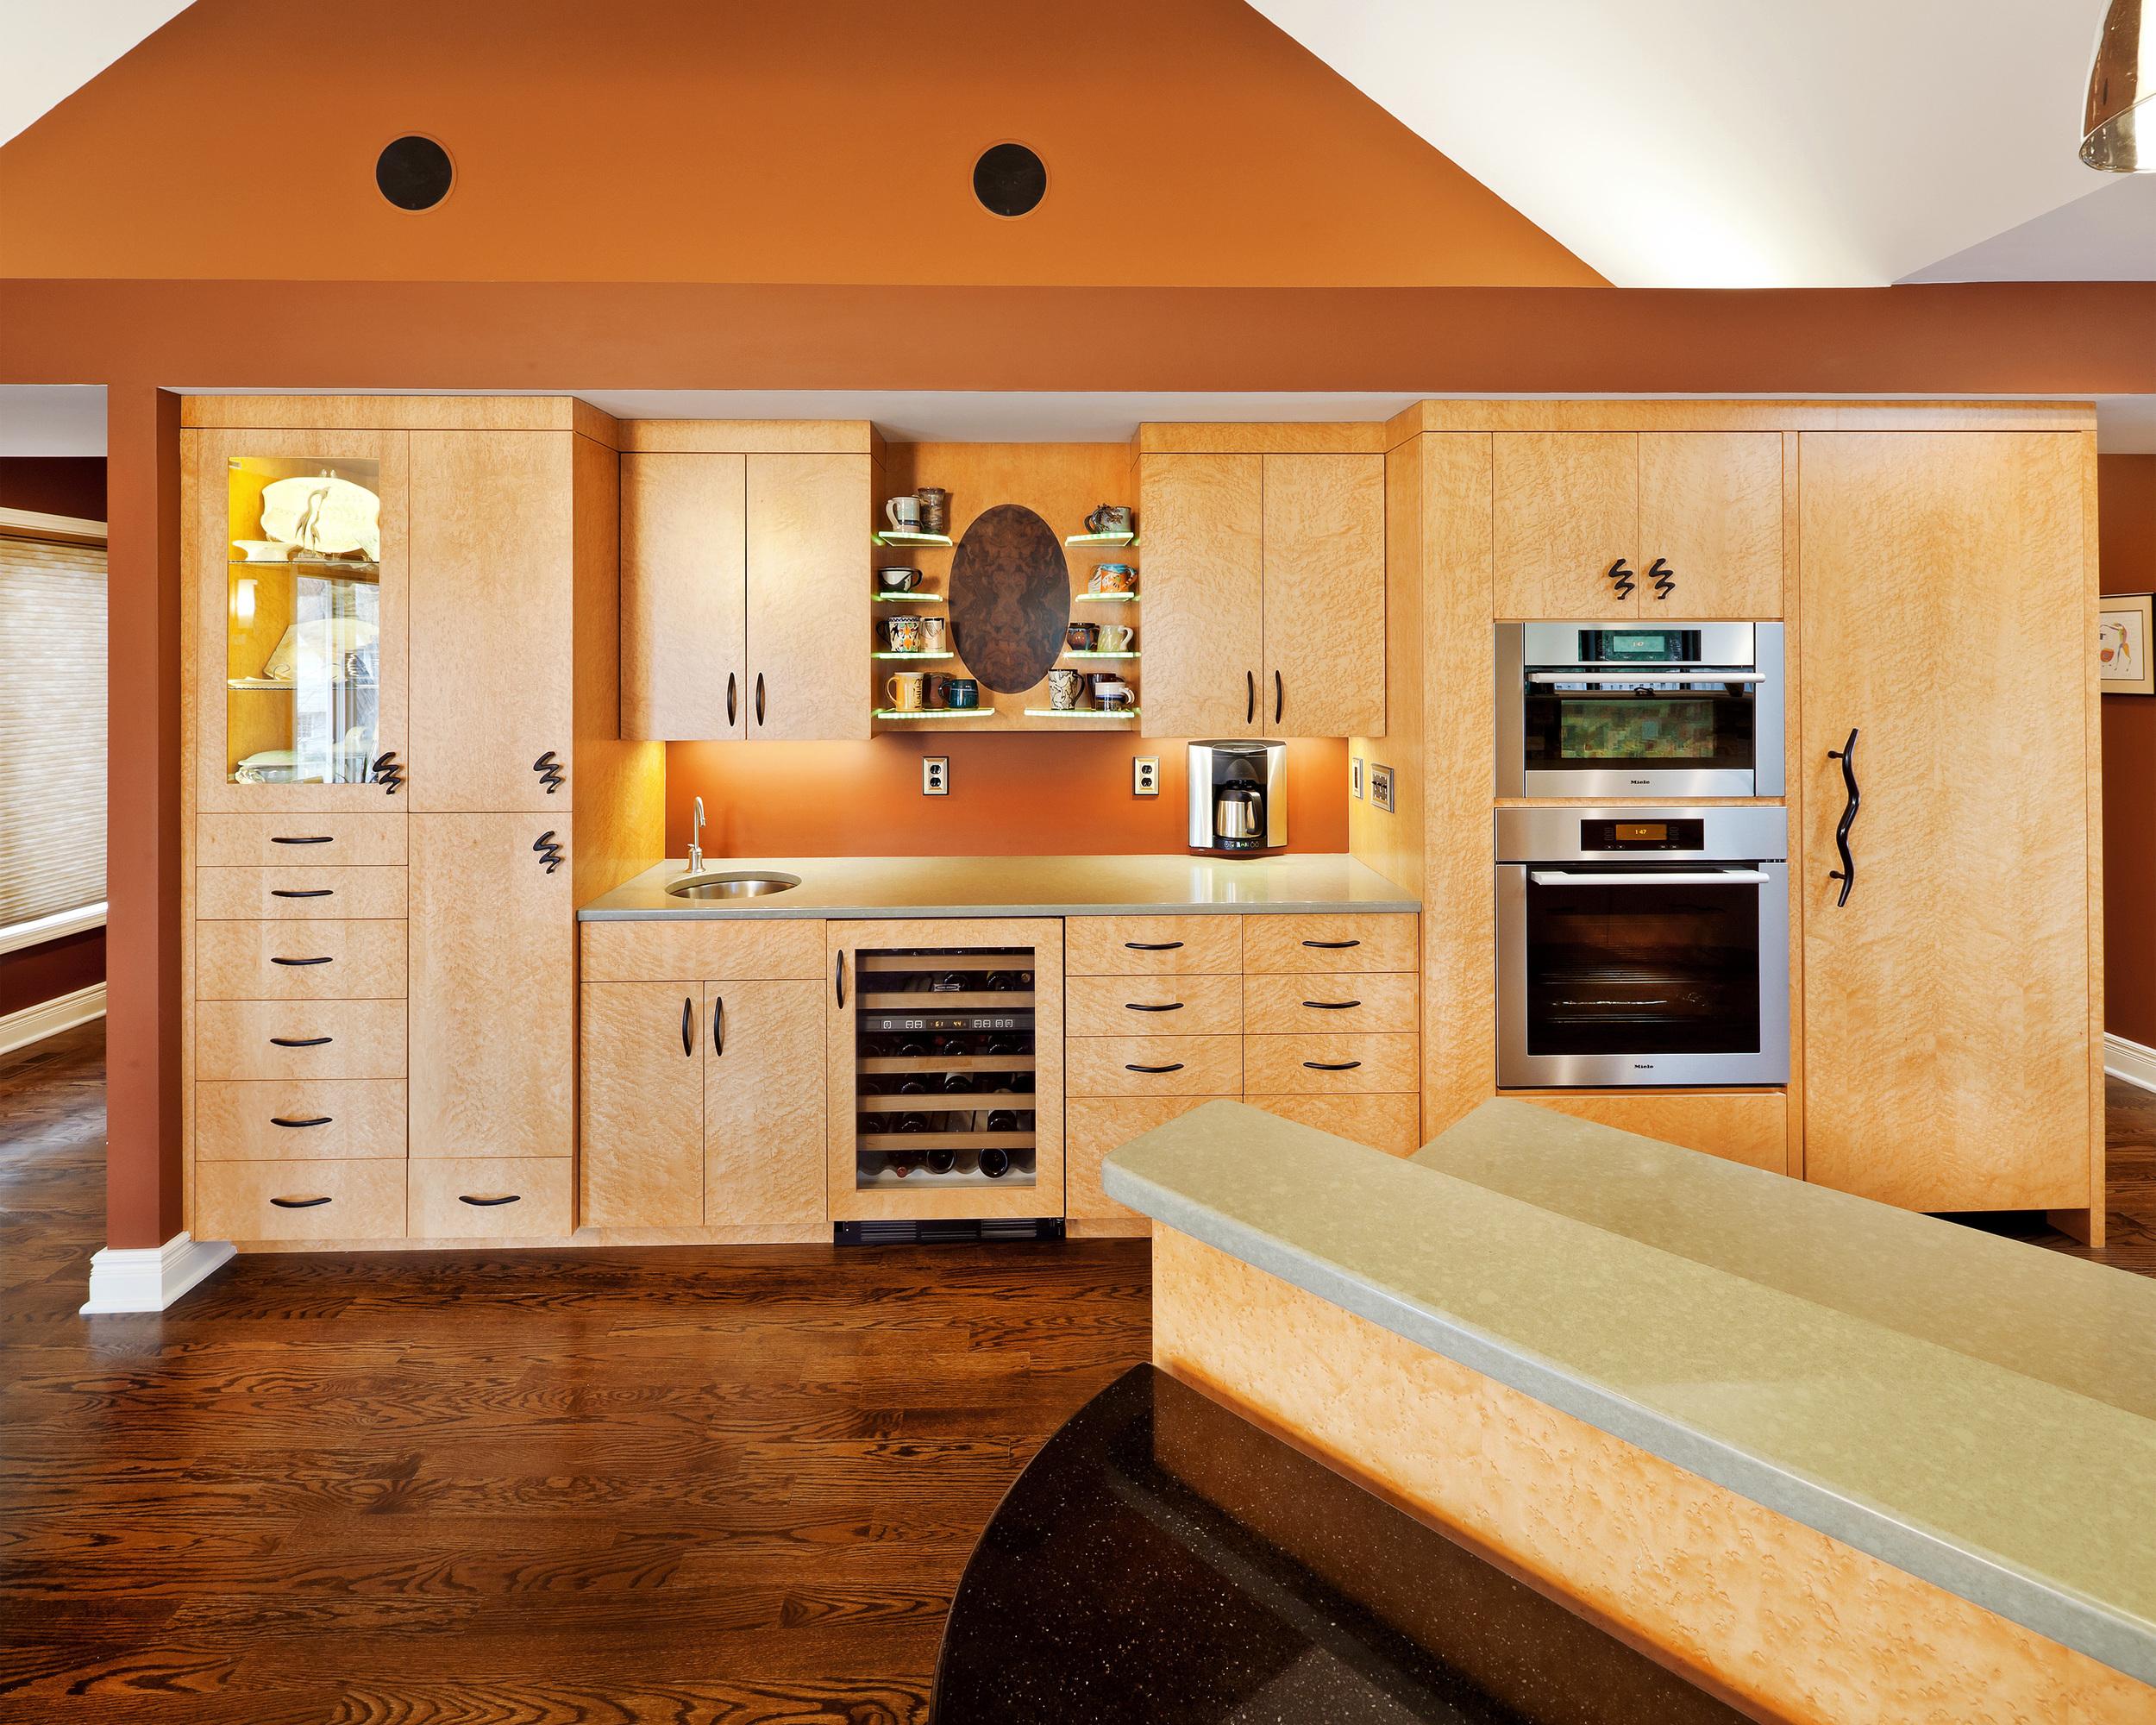 Bird's-eye maple cabinets in custom European-style flat fronts.